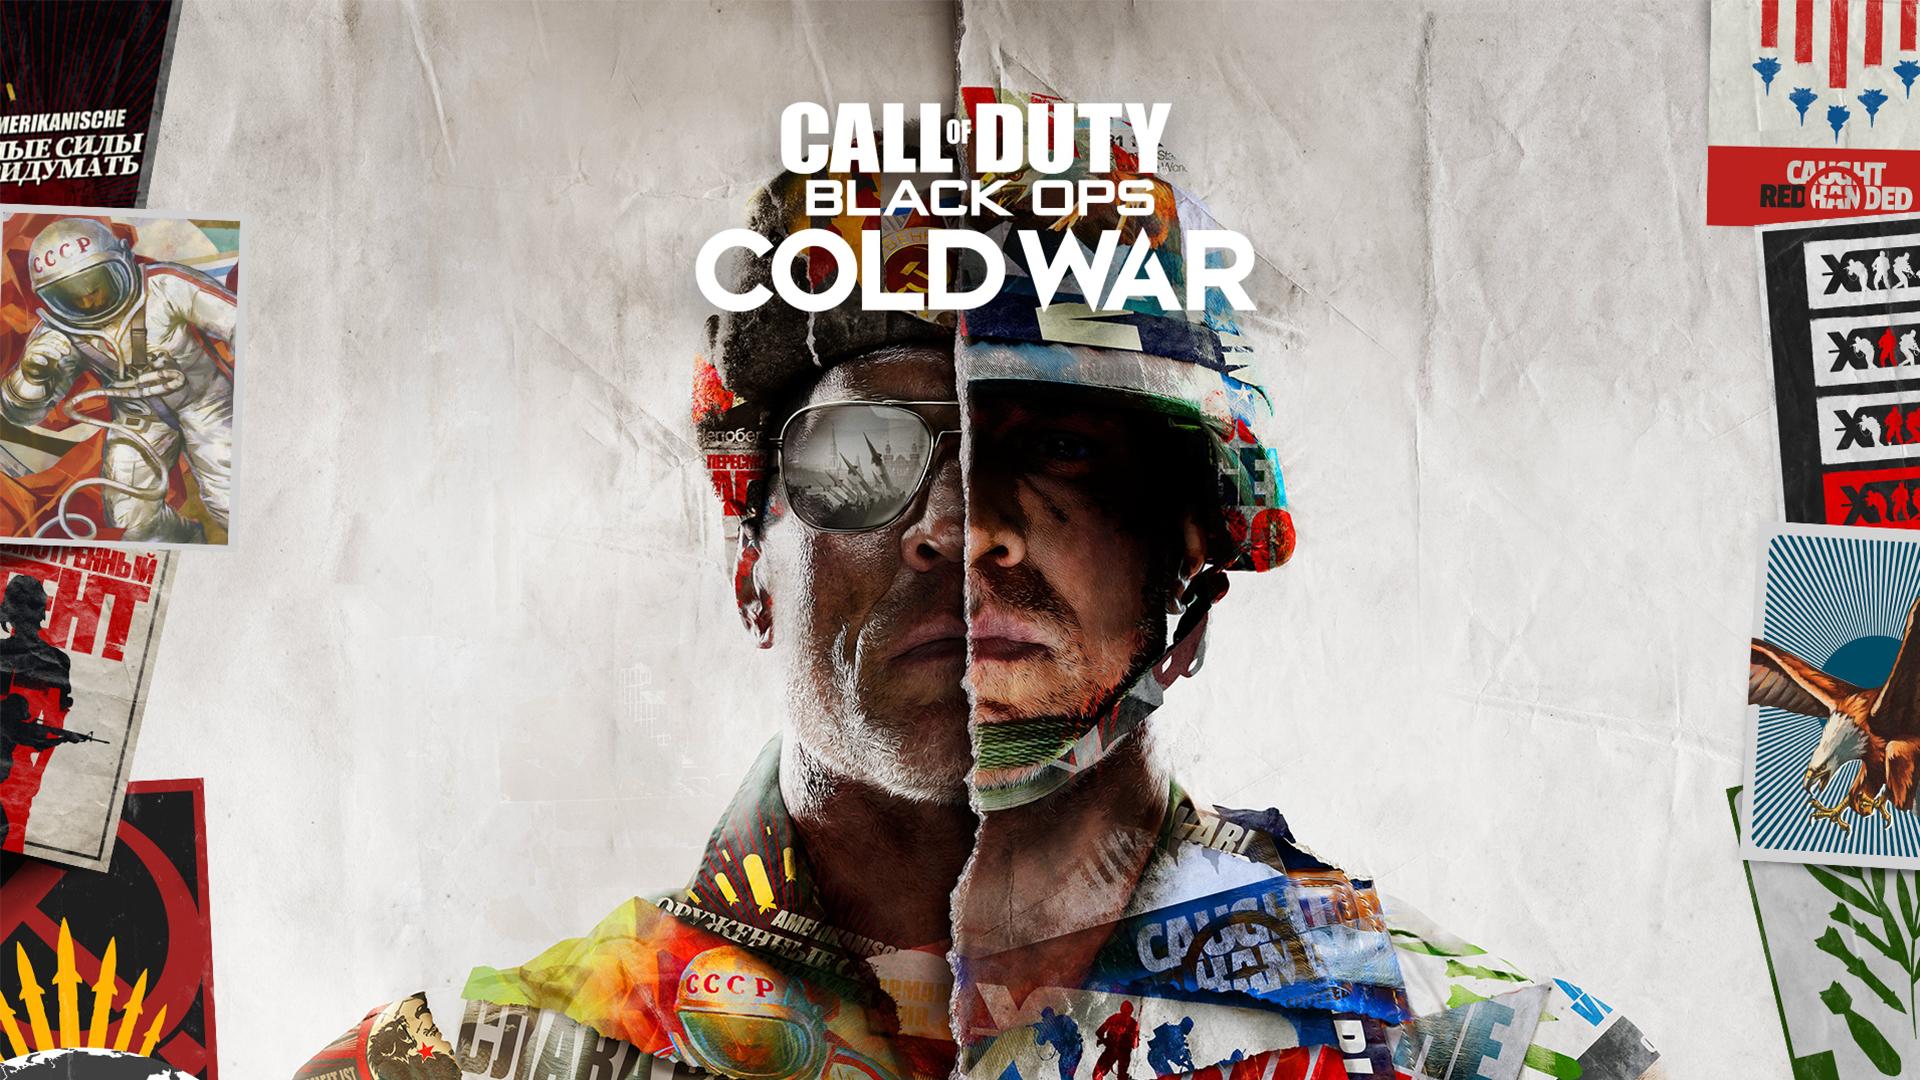 Call of Duty Black Ops Cold War Wallpaper, HD Games 4K ...